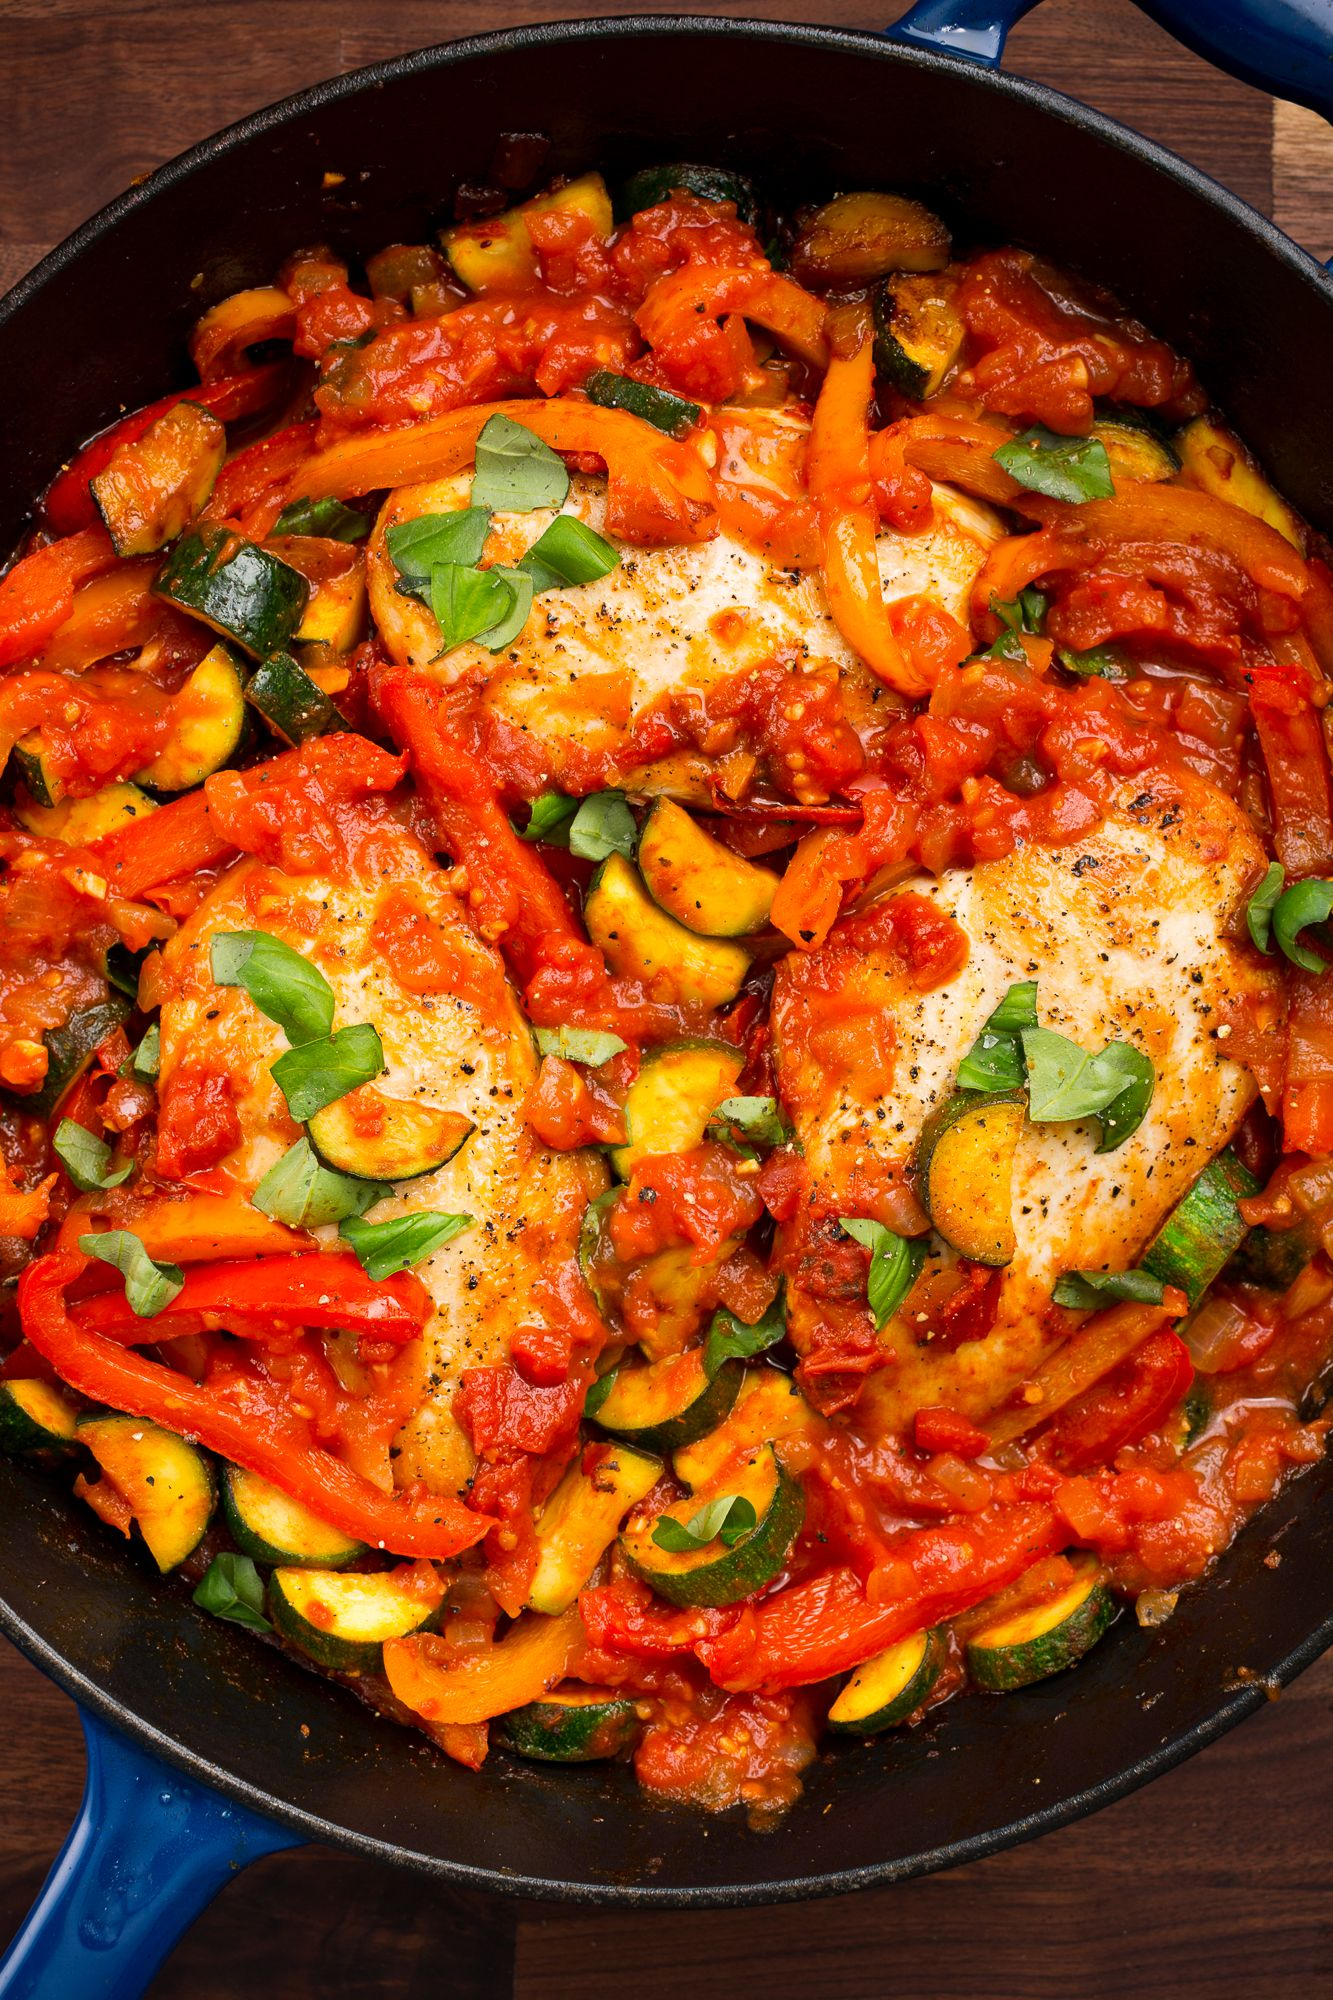 8+ Easy Italian Food Recipes - Best Italian Dinner Ideas